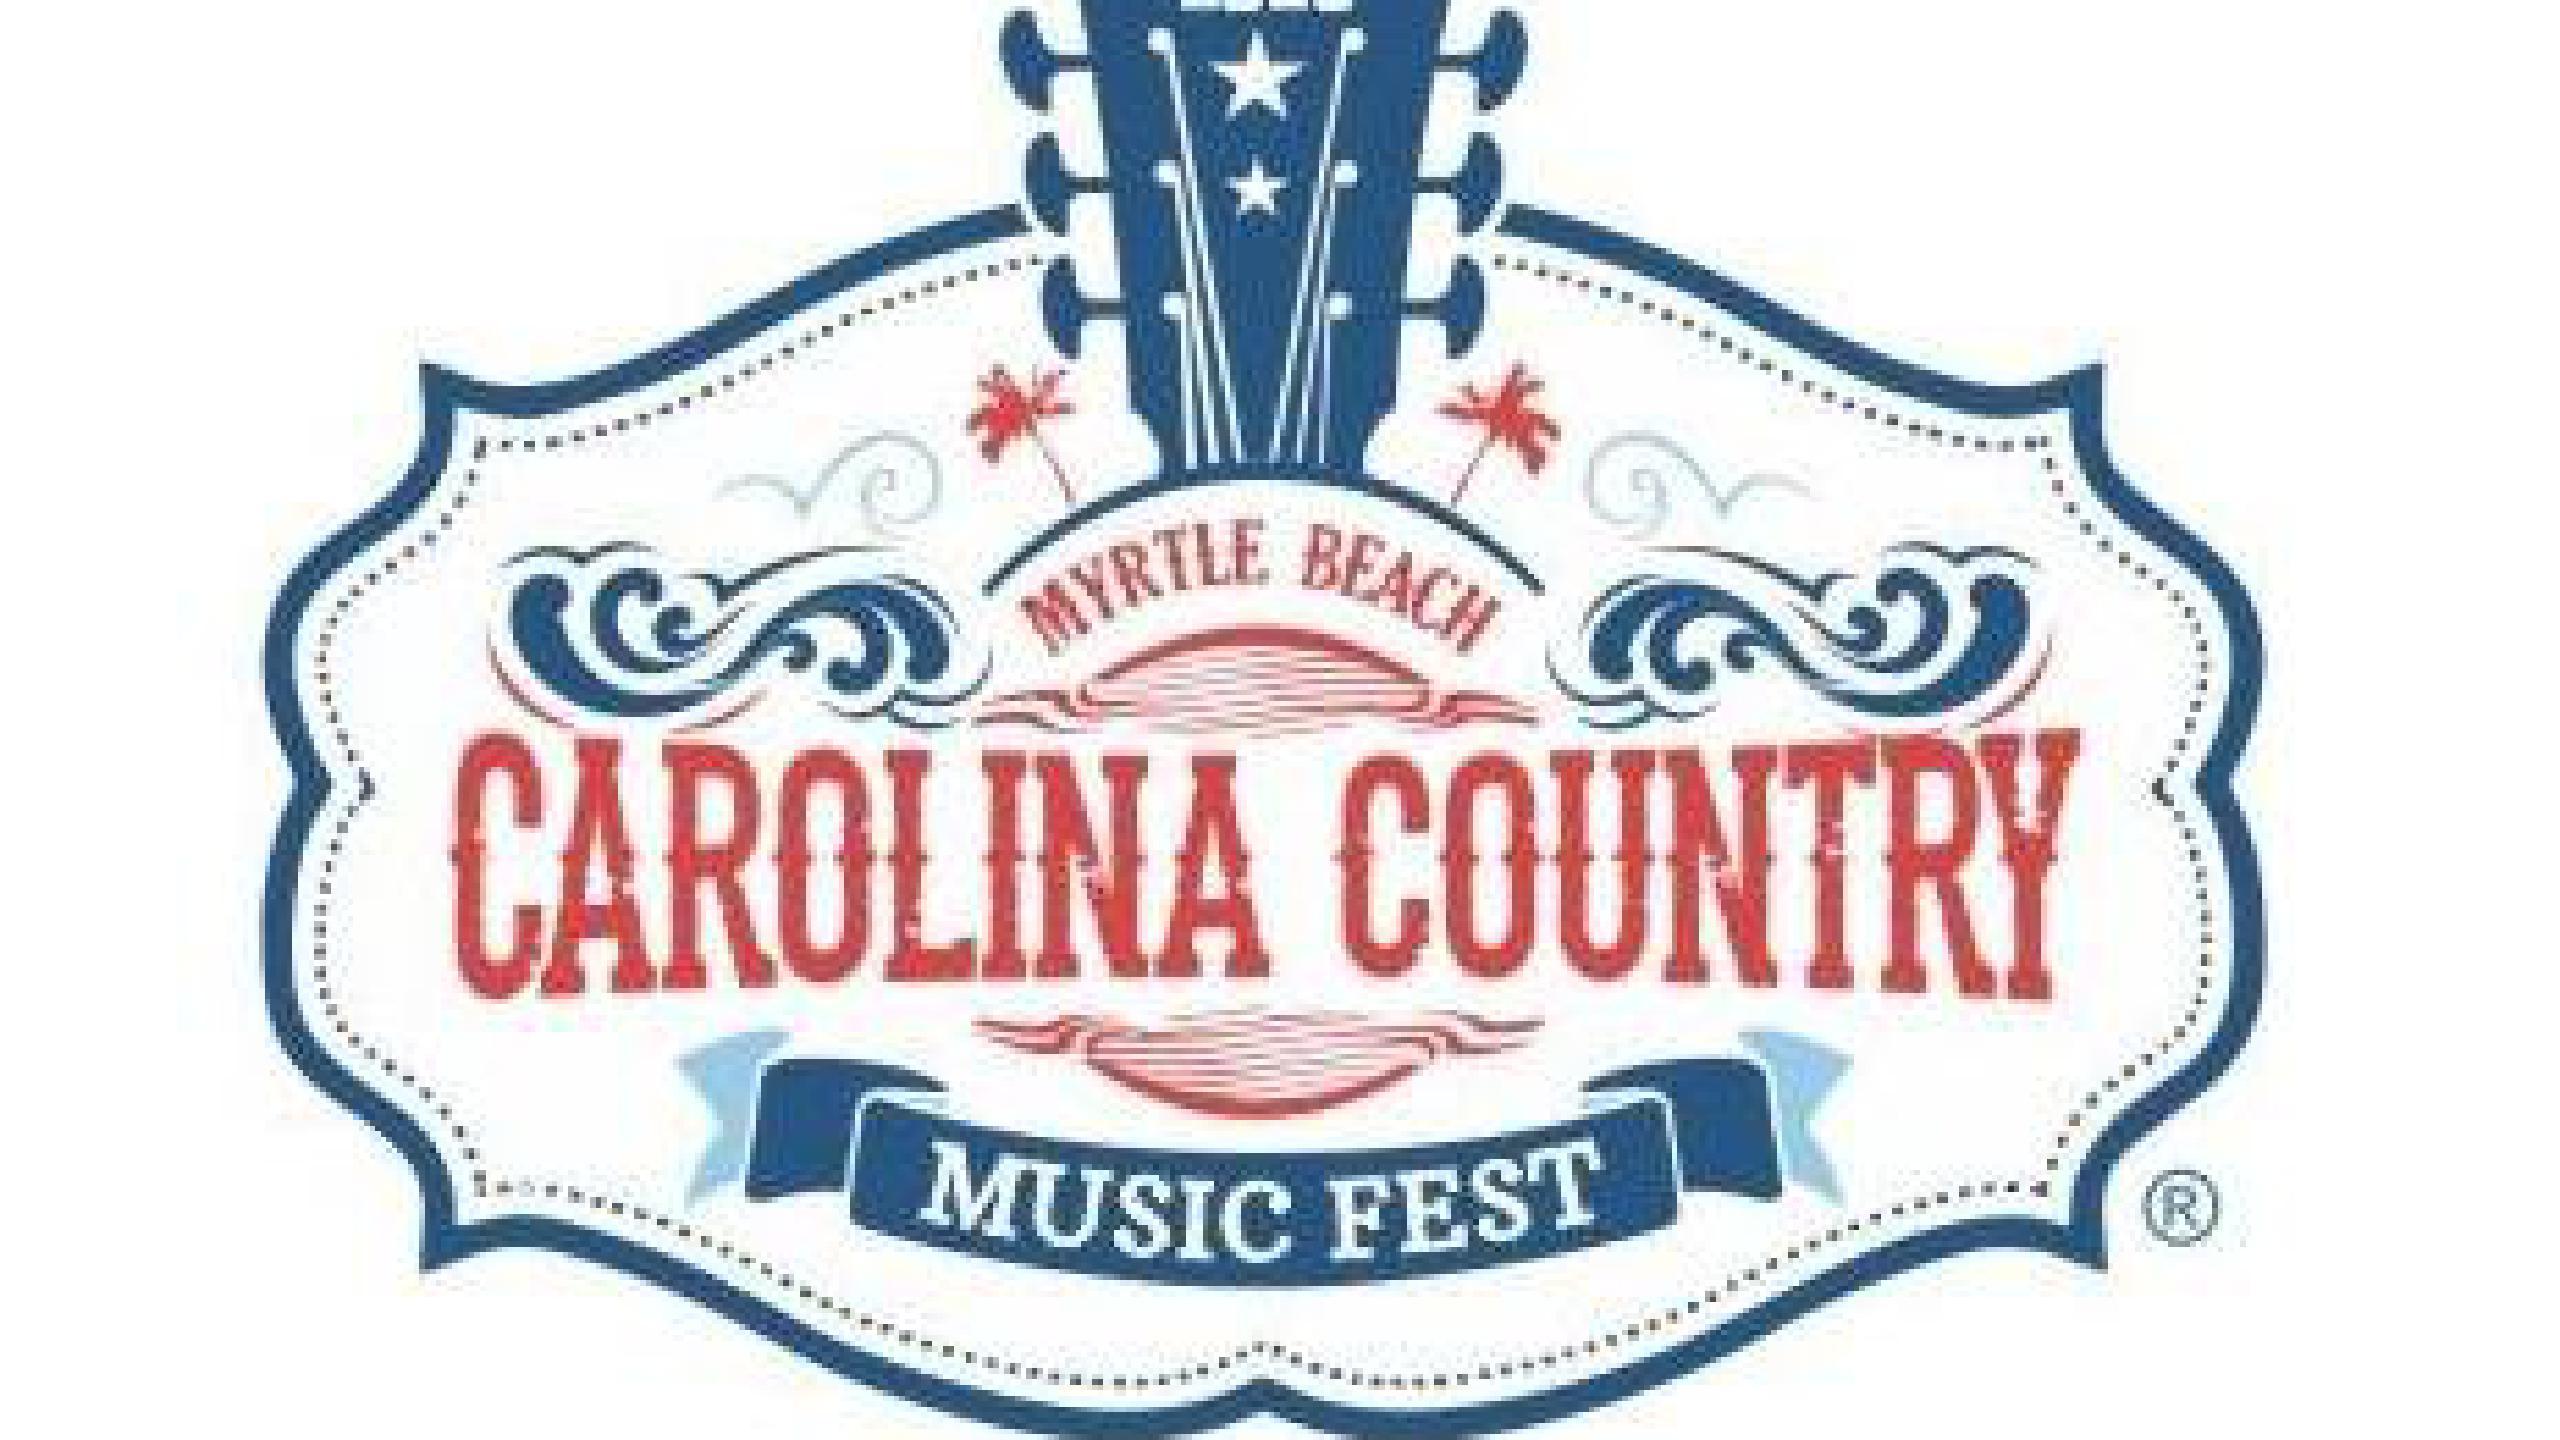 Myrtle Beach Country Music Festival 2020.Carolina Country Music Festival 2020 Tickets Lineup Bands